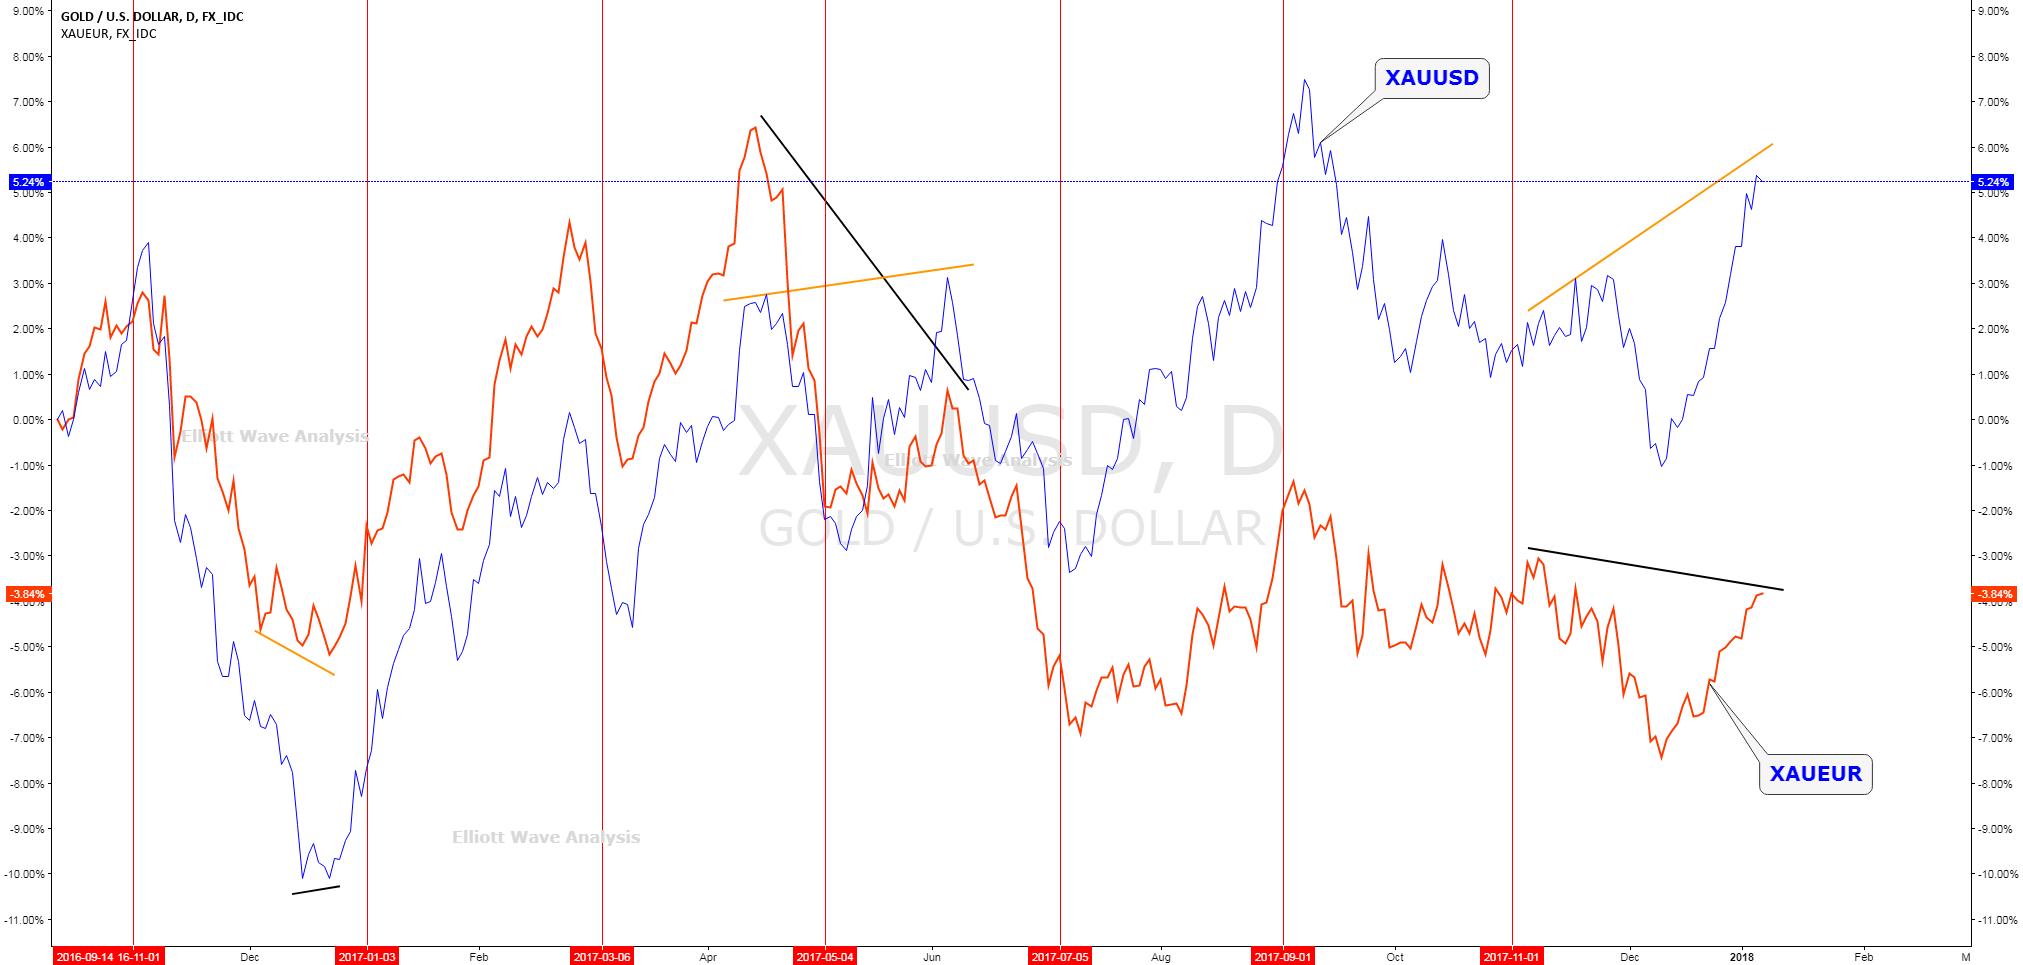 XAUUSD XAUEUR negative divergence